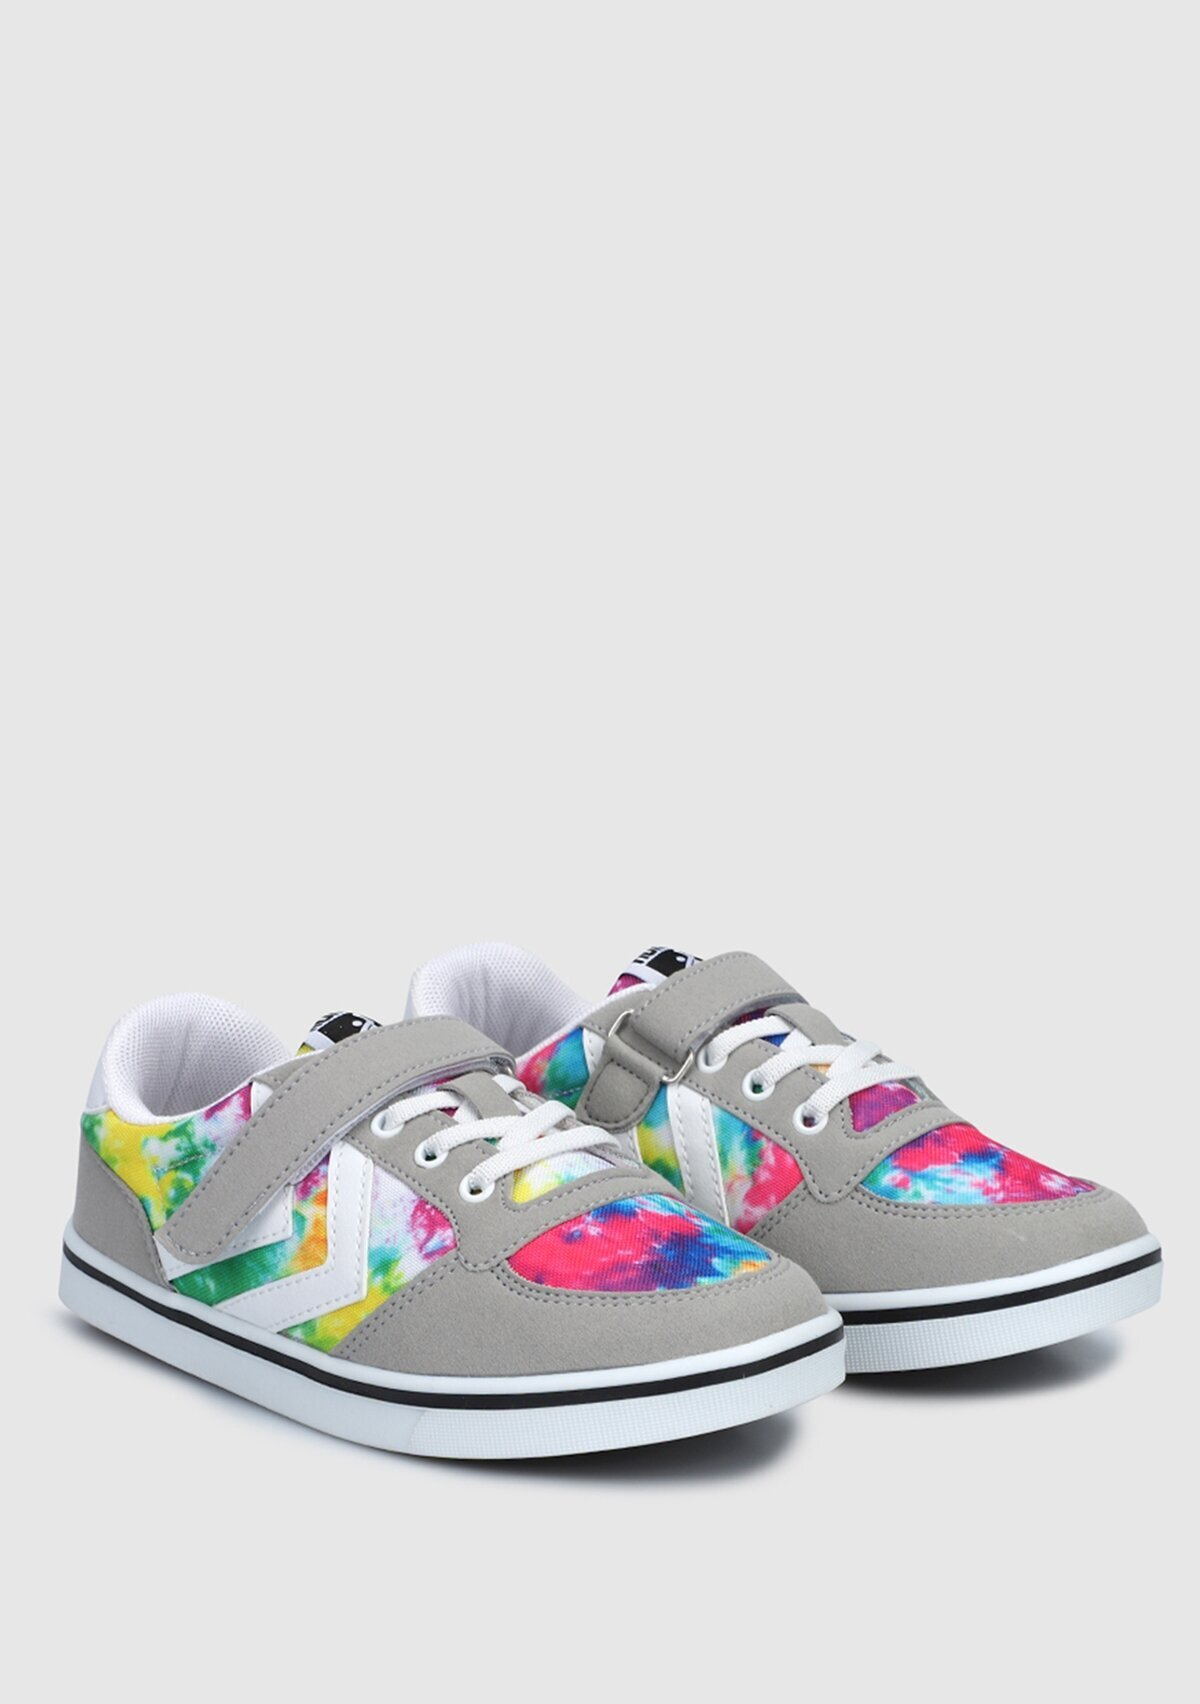 resm Hml Stadil Print Jr Multi Unisex Sneaker 212702-79